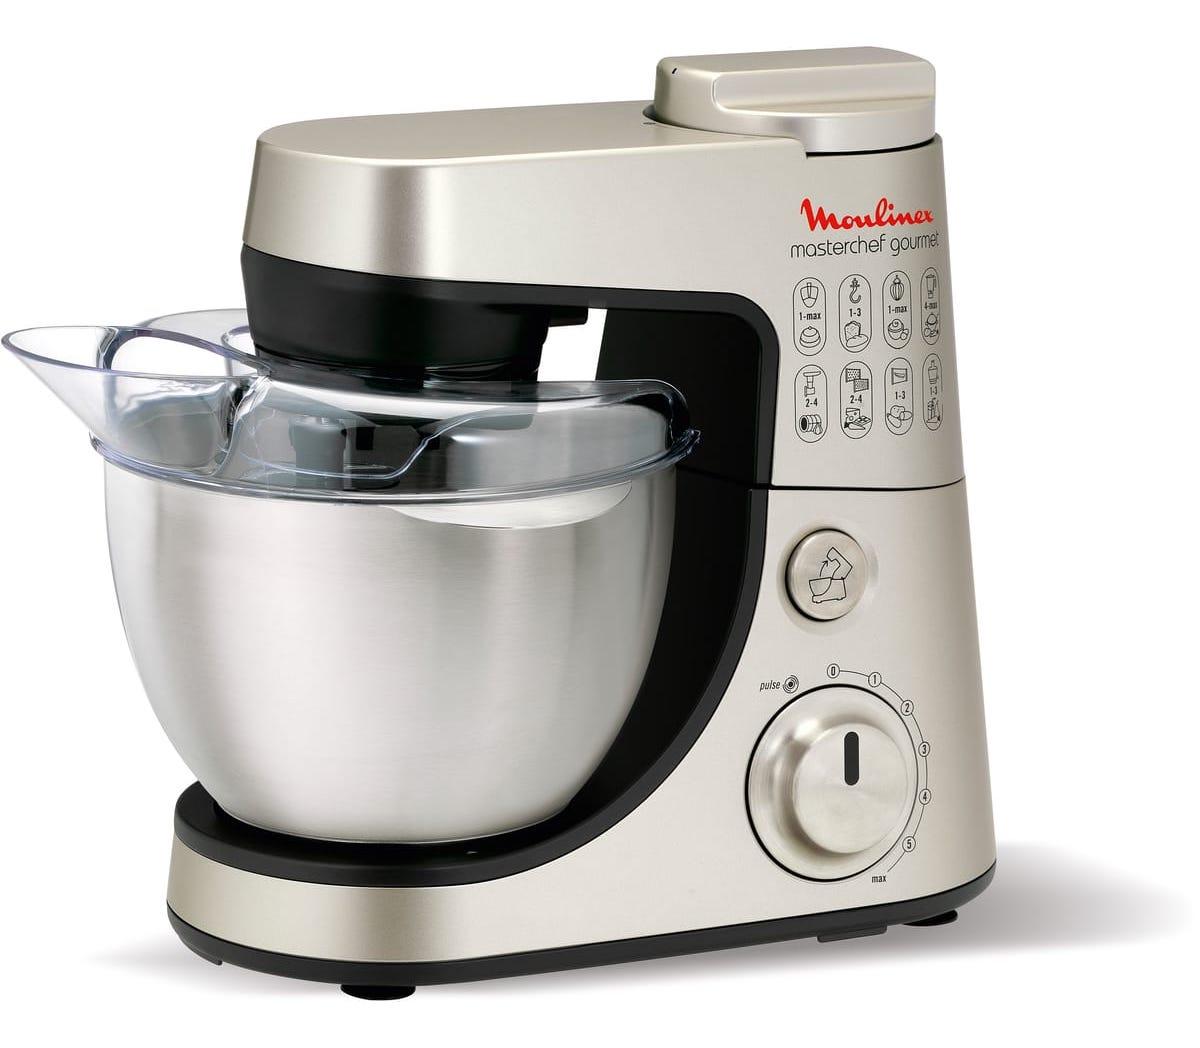 Soldes229€–MOULINEX QA405HB1, robot pâtissier